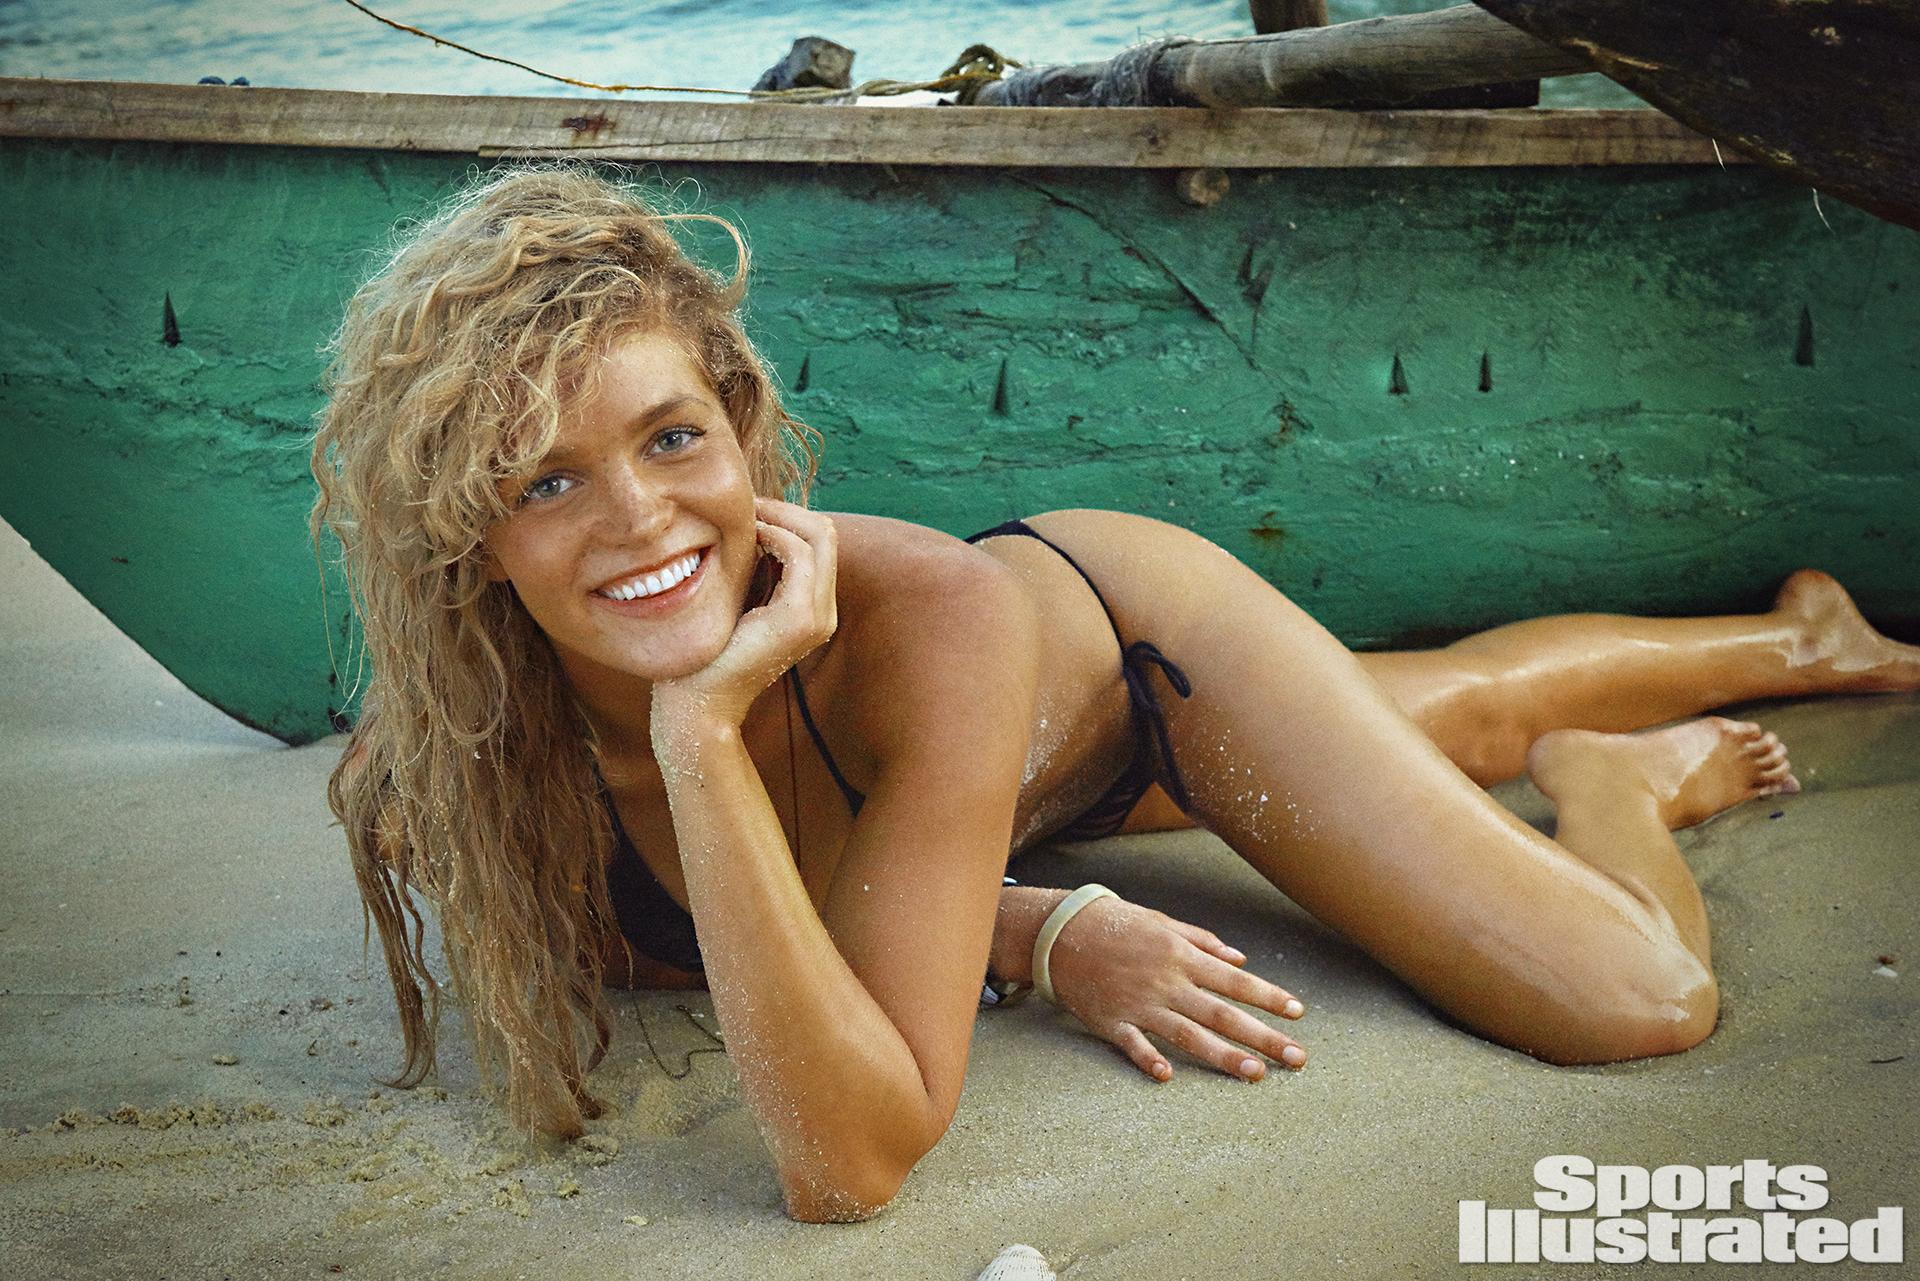 Erin Heatherton was photographed by Ruven Afanador in Zanzibar. Swimsuit by Kate Swim.